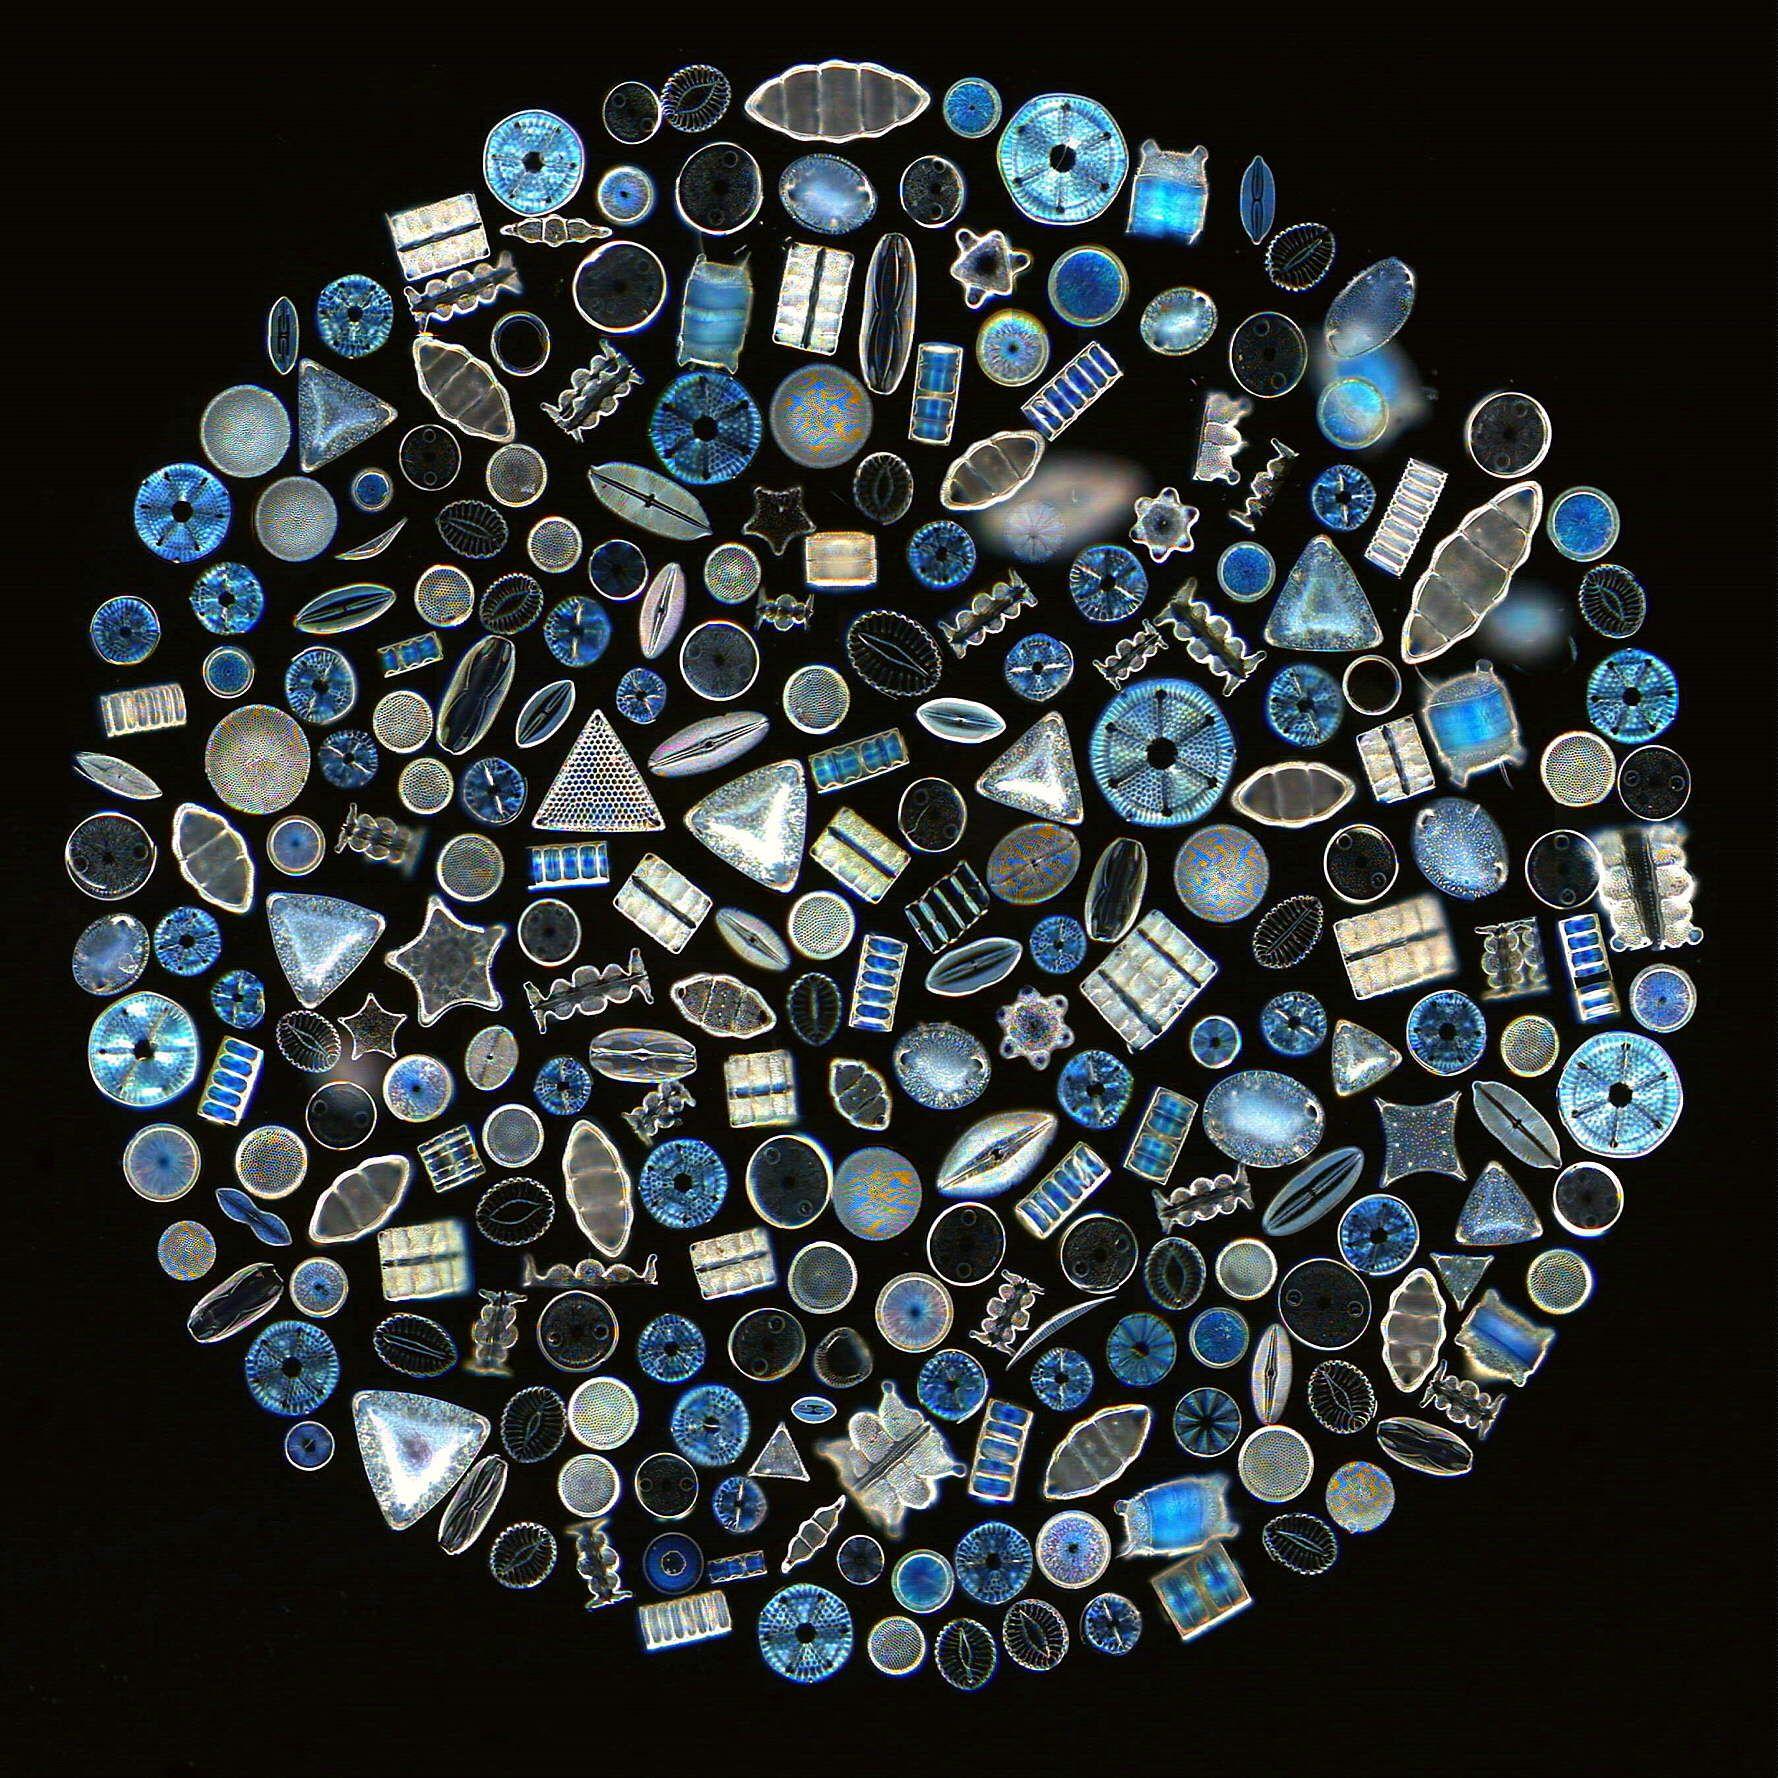 Nano Silica Diatoms Nualgi Aquarium Diatom Microscopic Microscopic Photography [ 1778 x 1778 Pixel ]